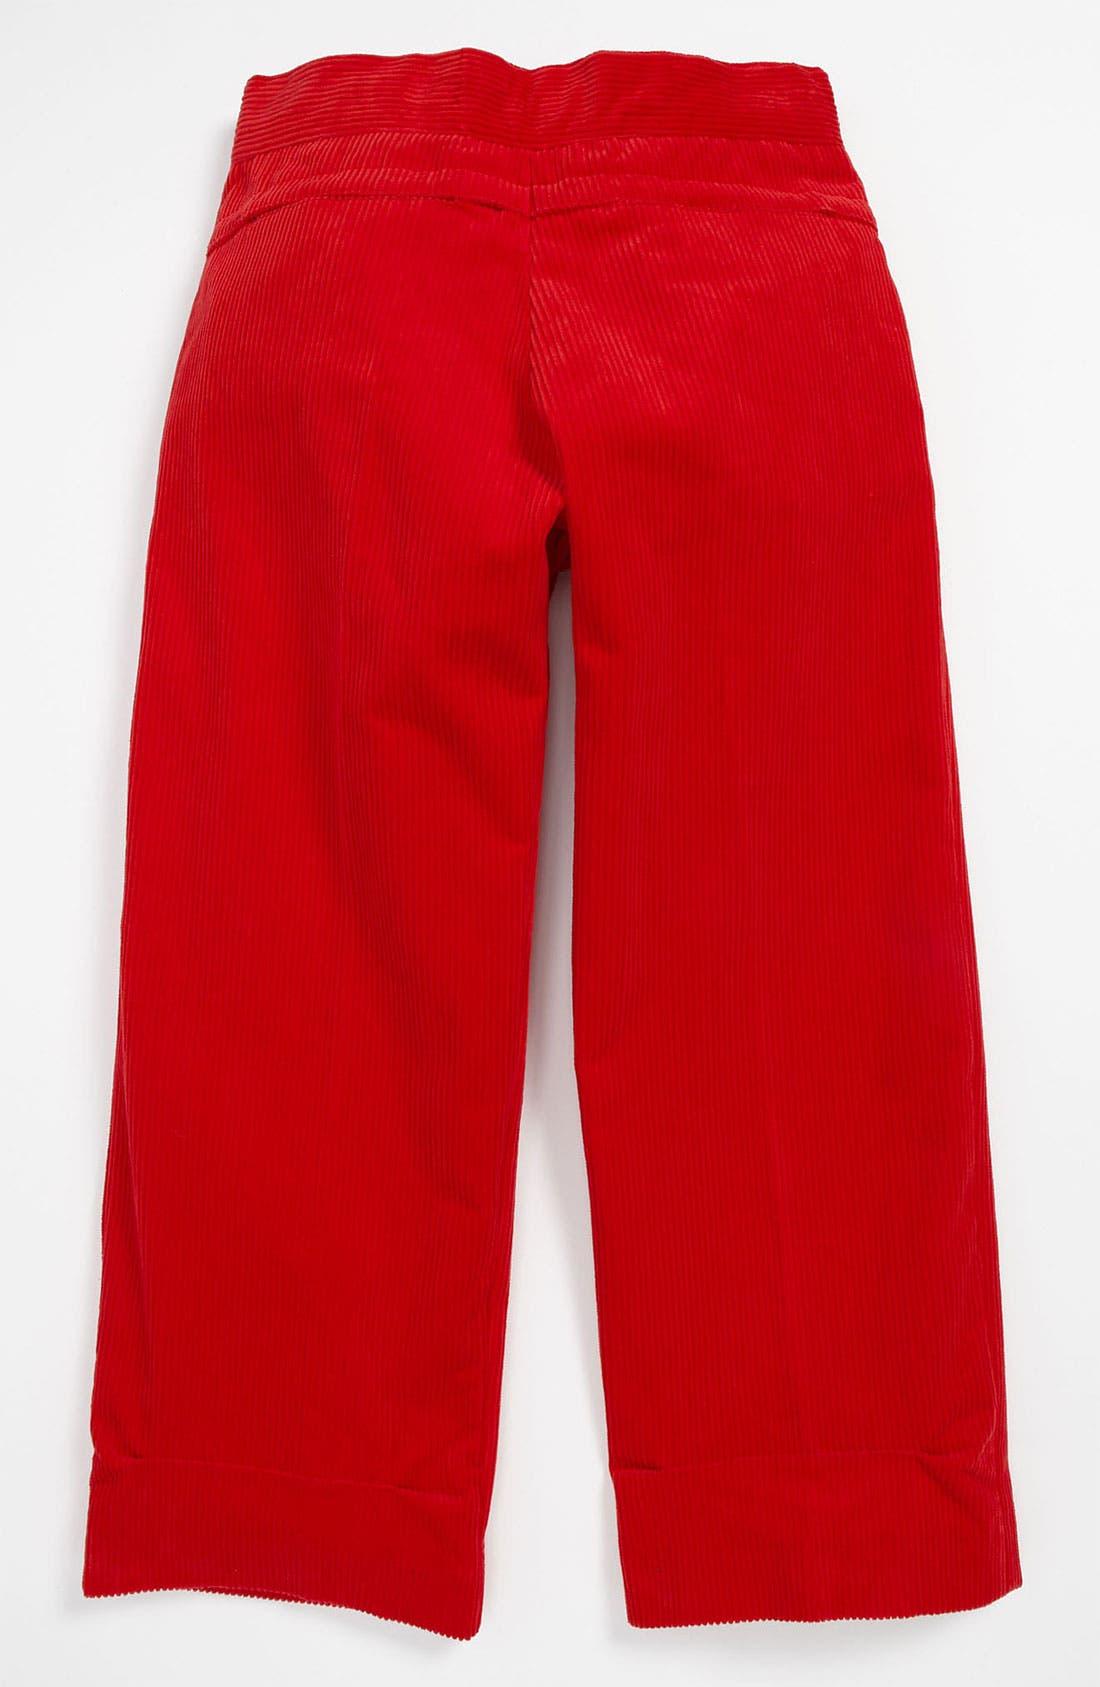 Alternate Image 1 Selected - Marni Corduroy Pants (Little Girls & Big Girls)